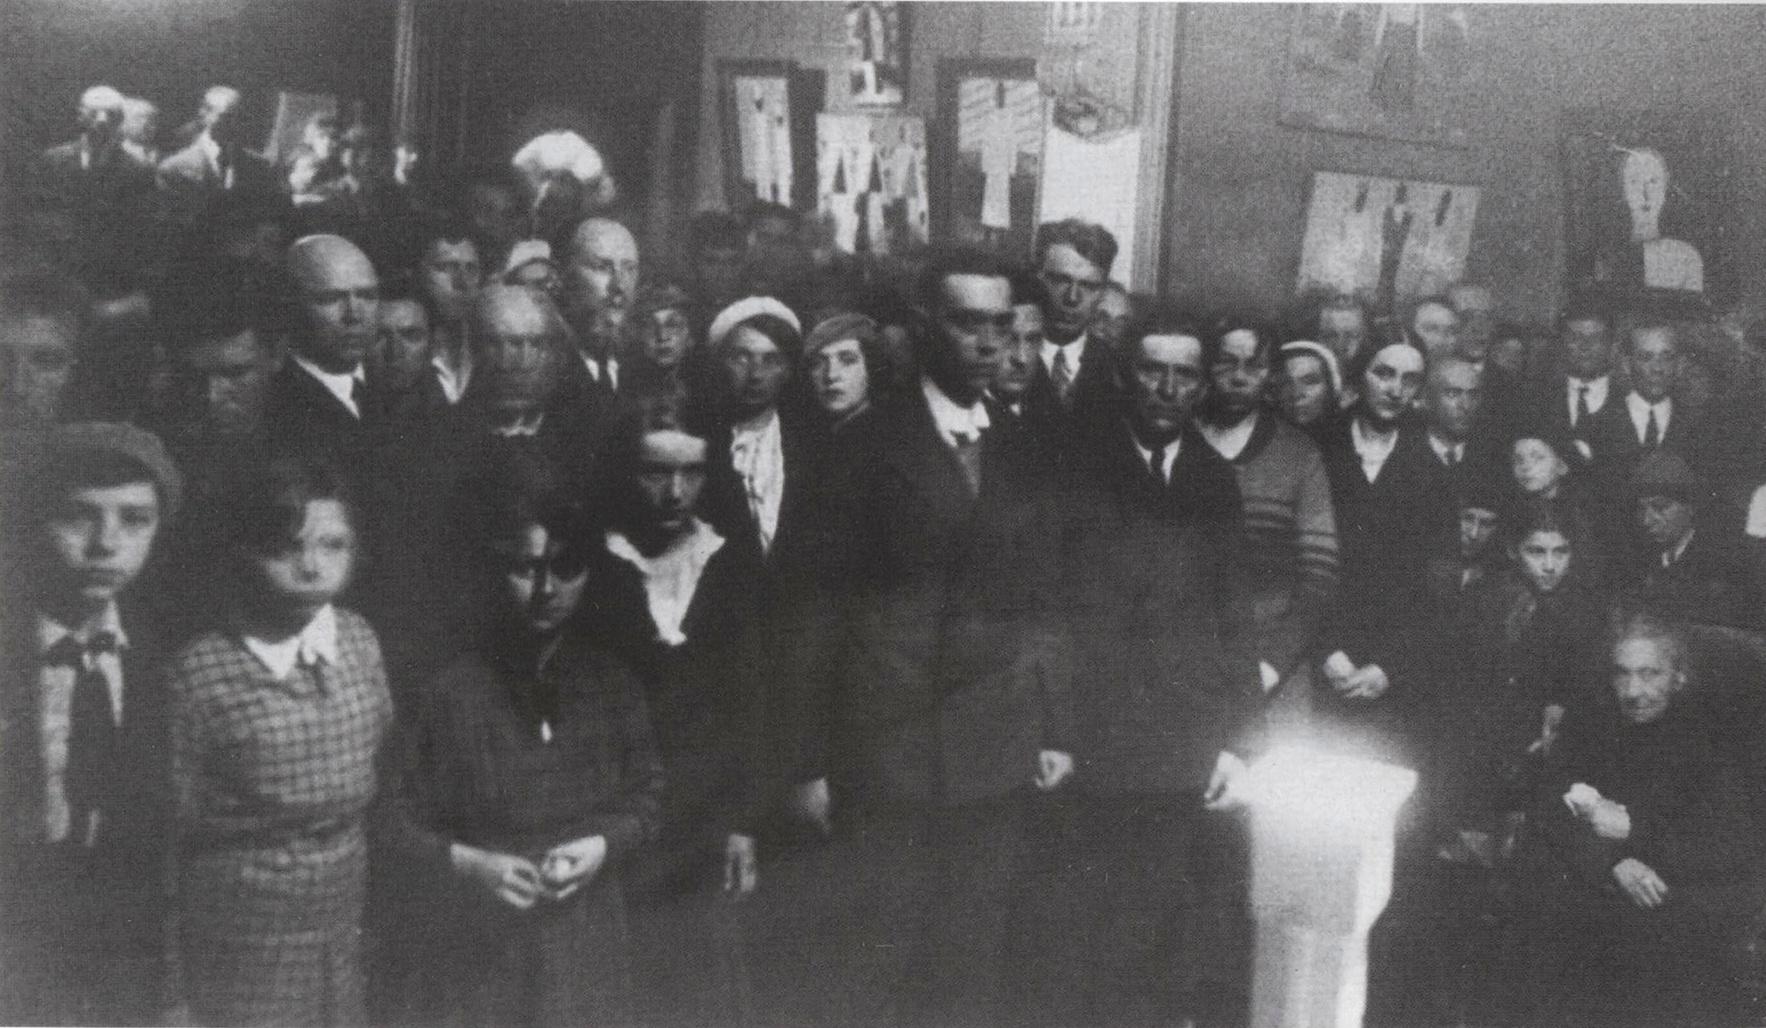 Attendants of Kazimir Malevich's funeral (1935)